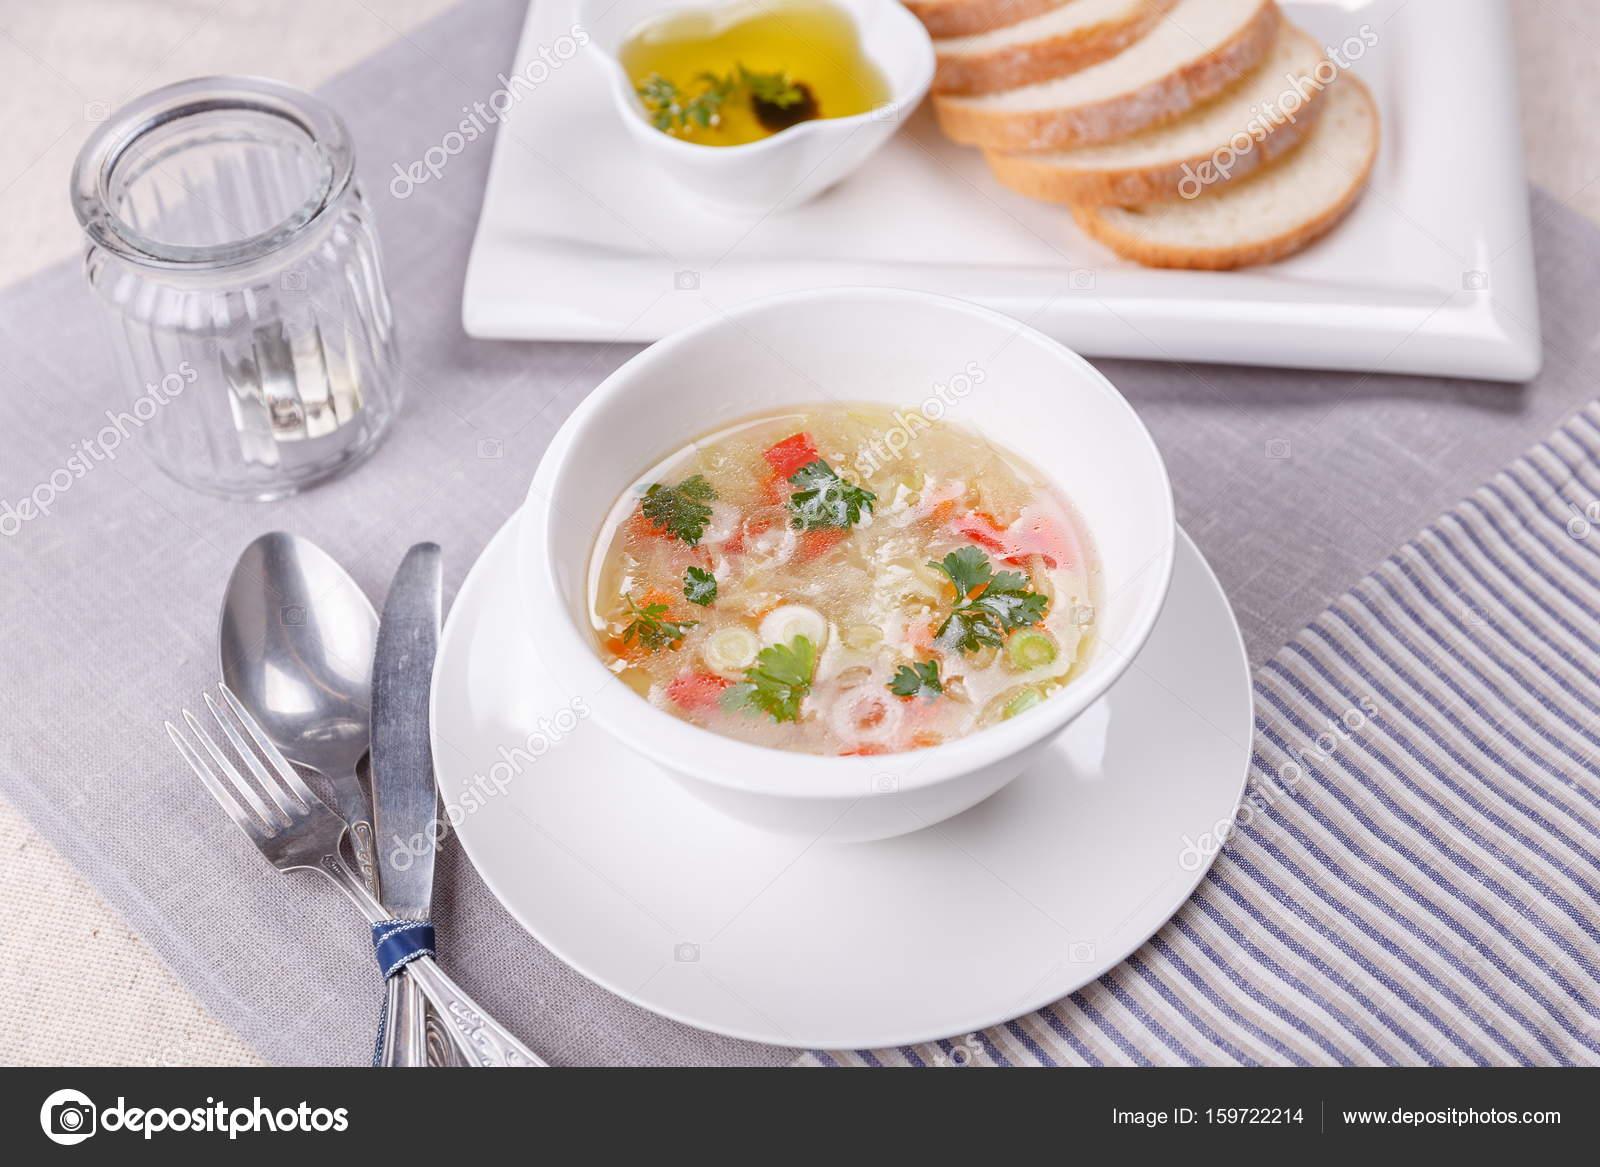 Taze sebzeli çorba